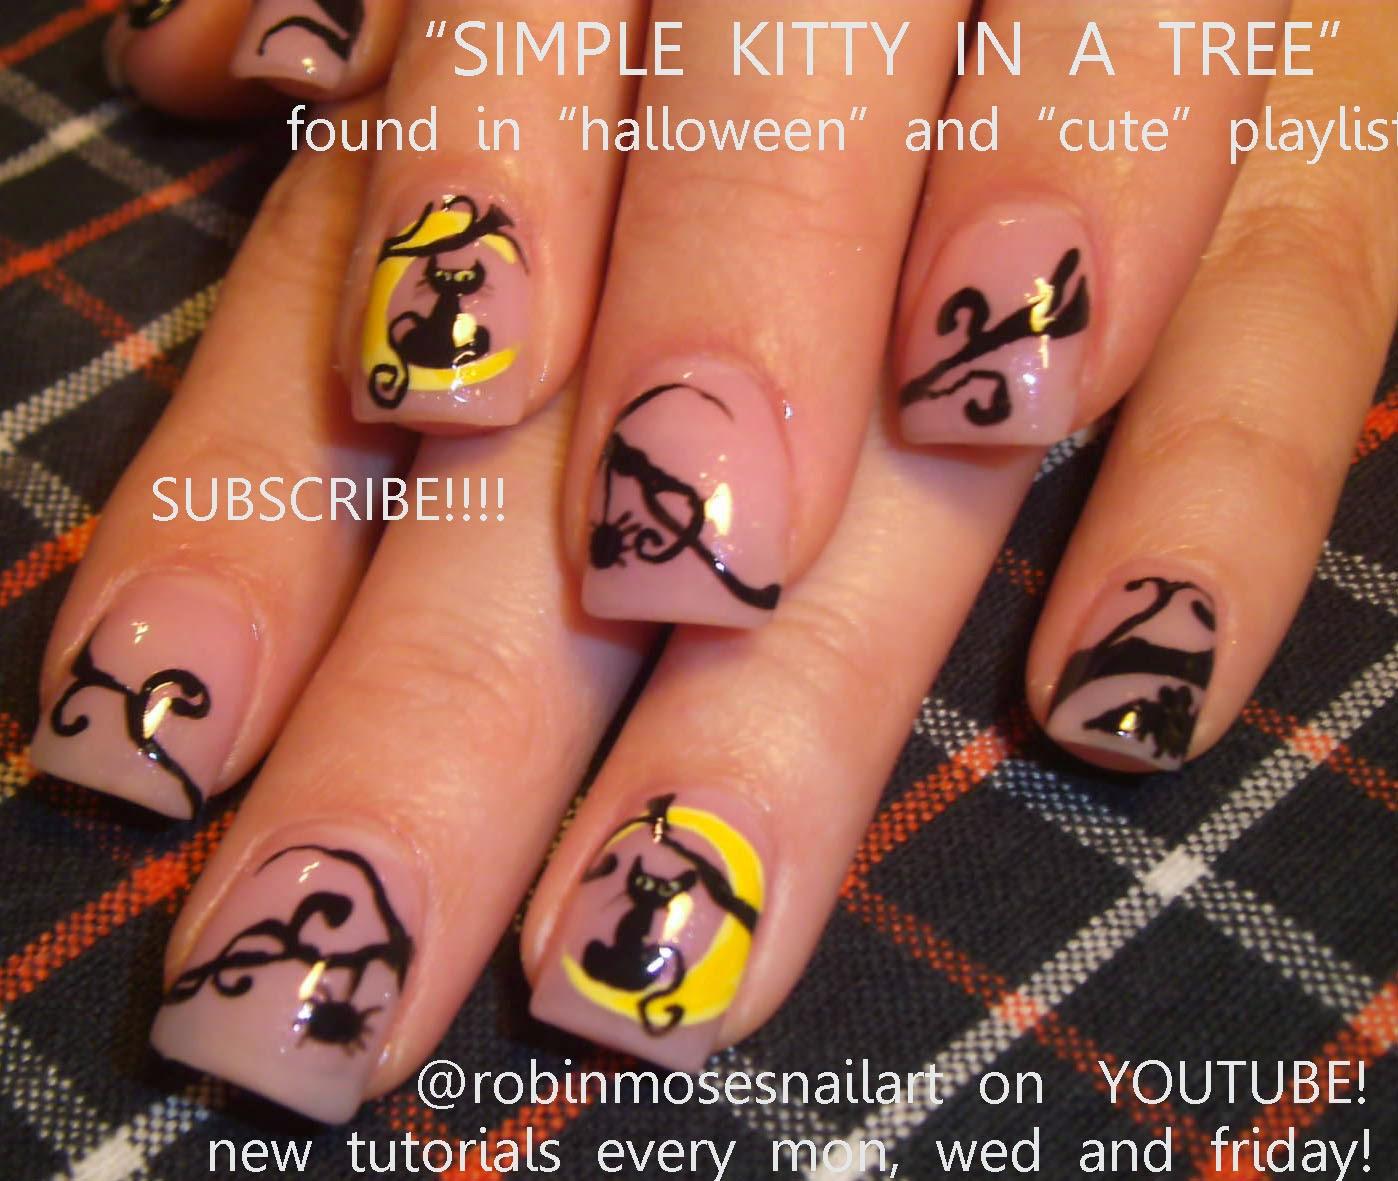 ideas for halloween nails - robin moses nail art - 100+ [ Ideas For Halloween Nails ] Nail 334 0 Jpg 1200 1600